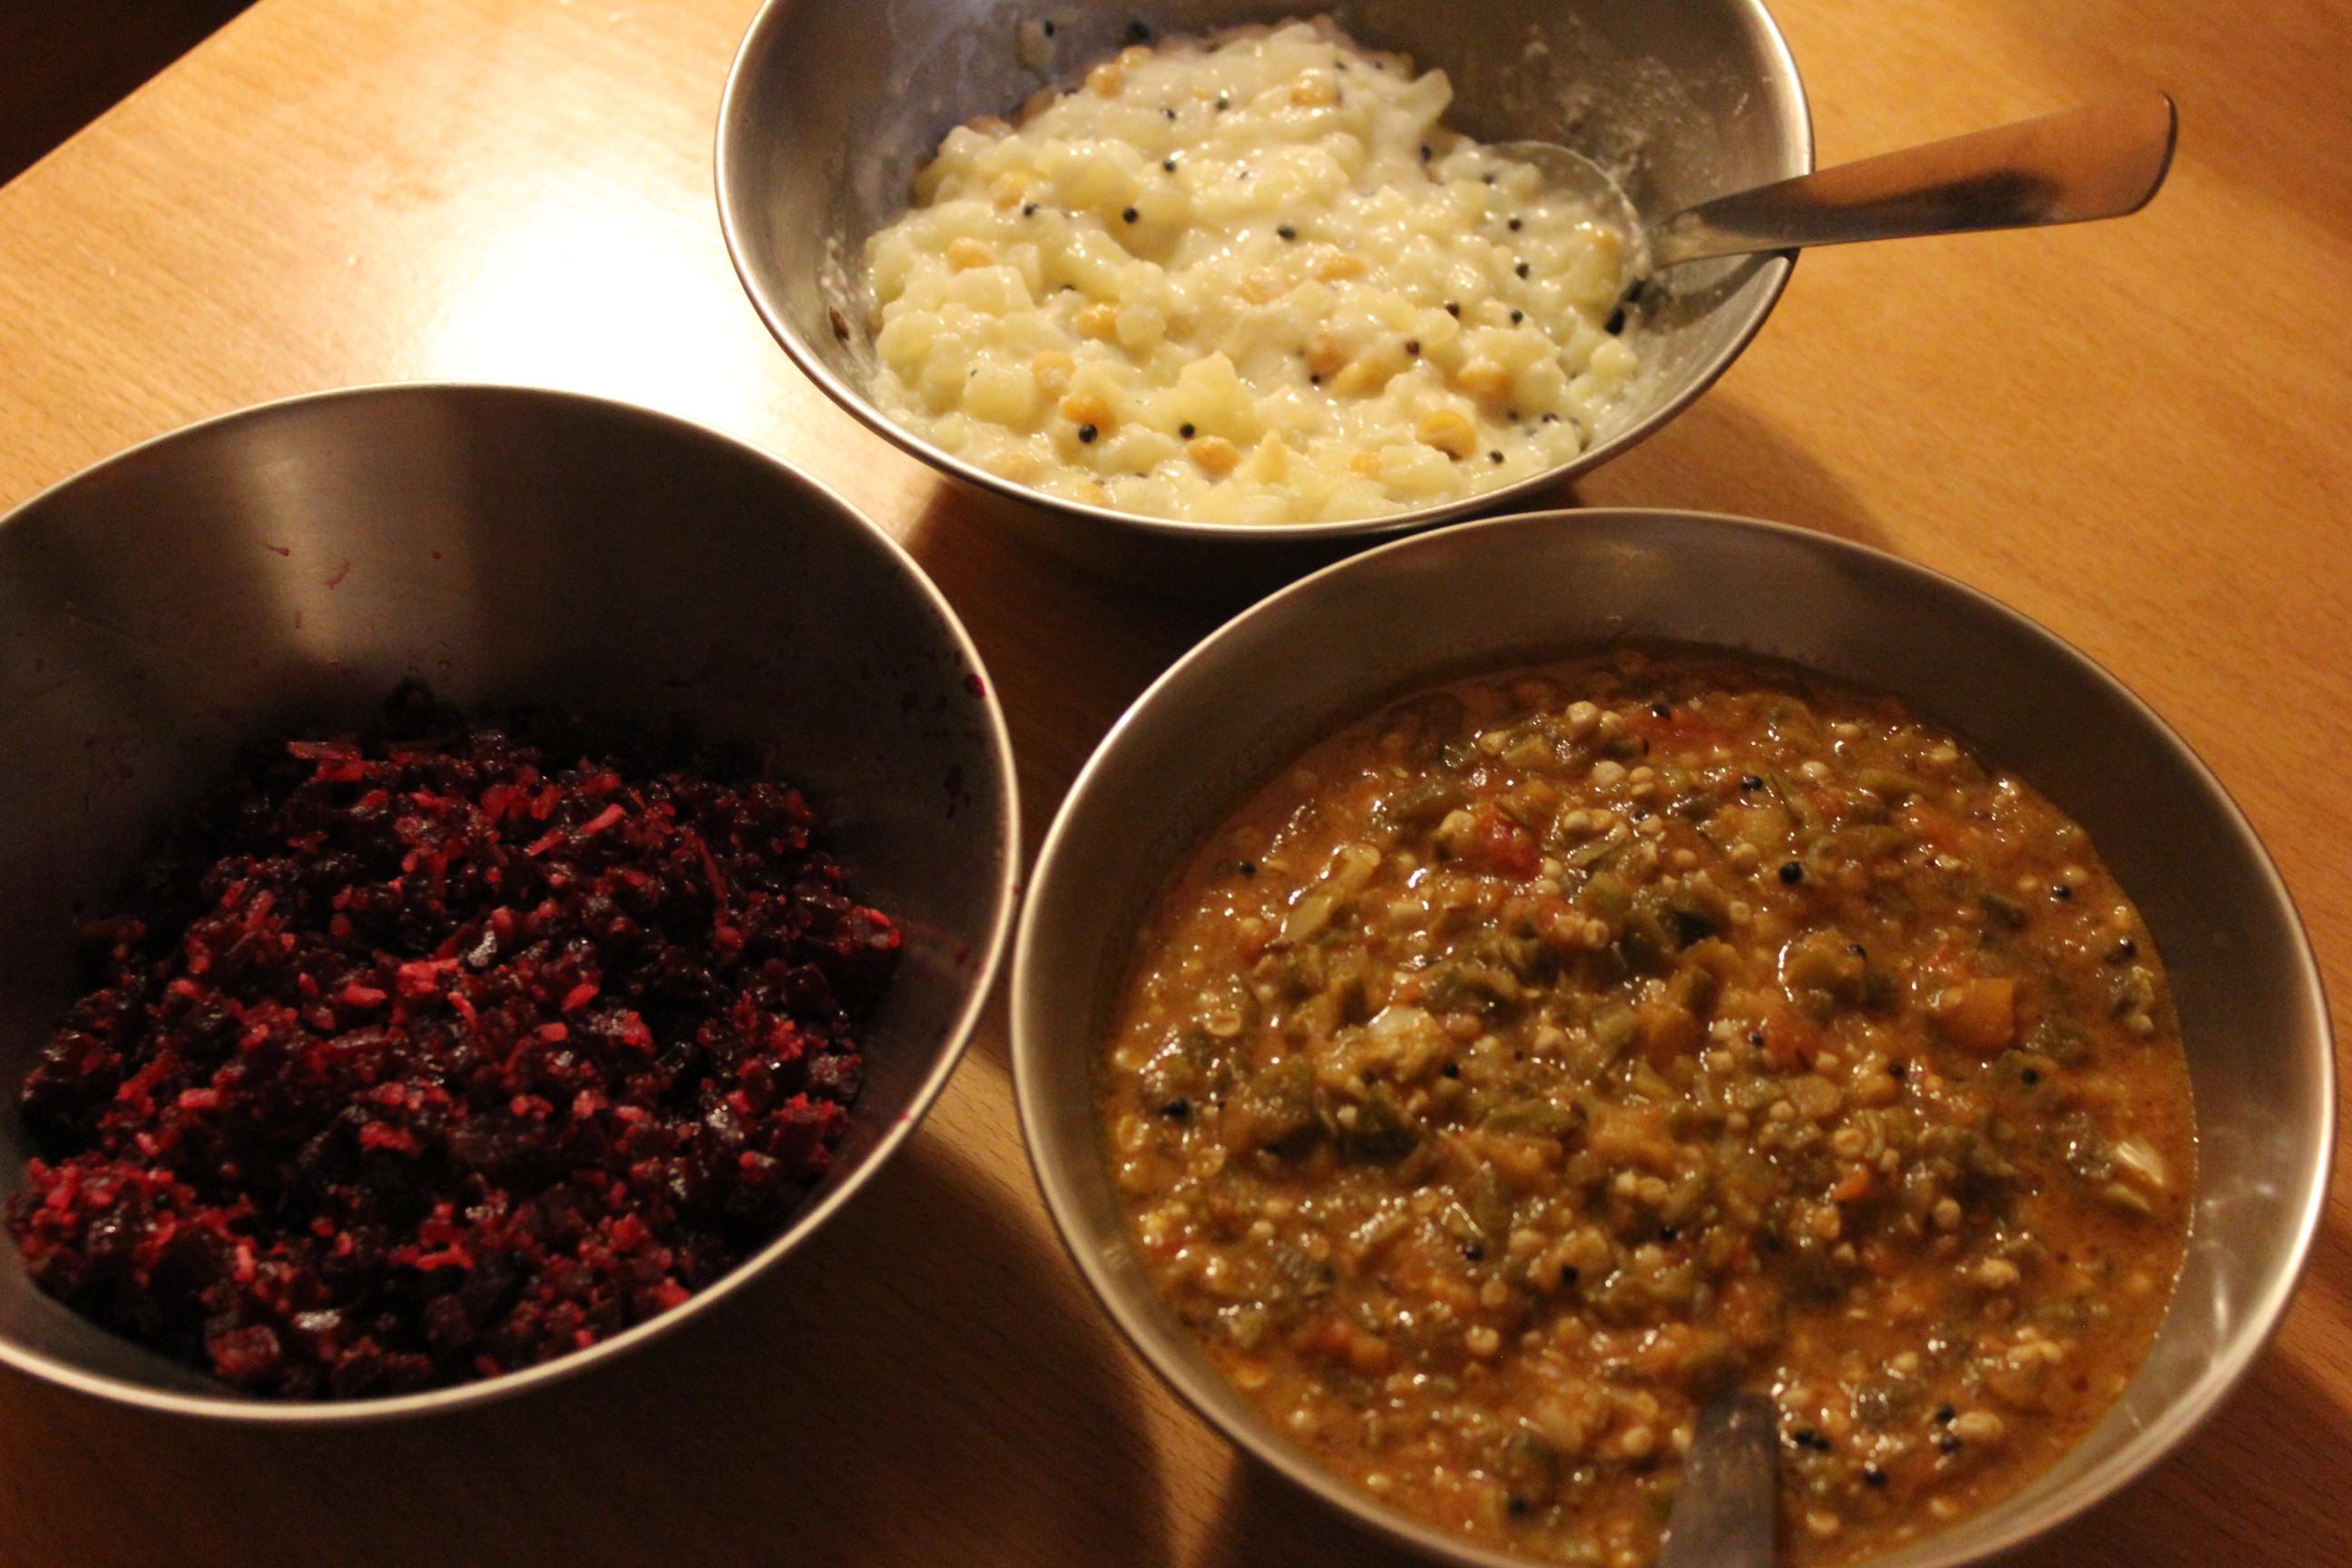 Sree sabareesのようなミールスが作りたい人向けのレシピ集